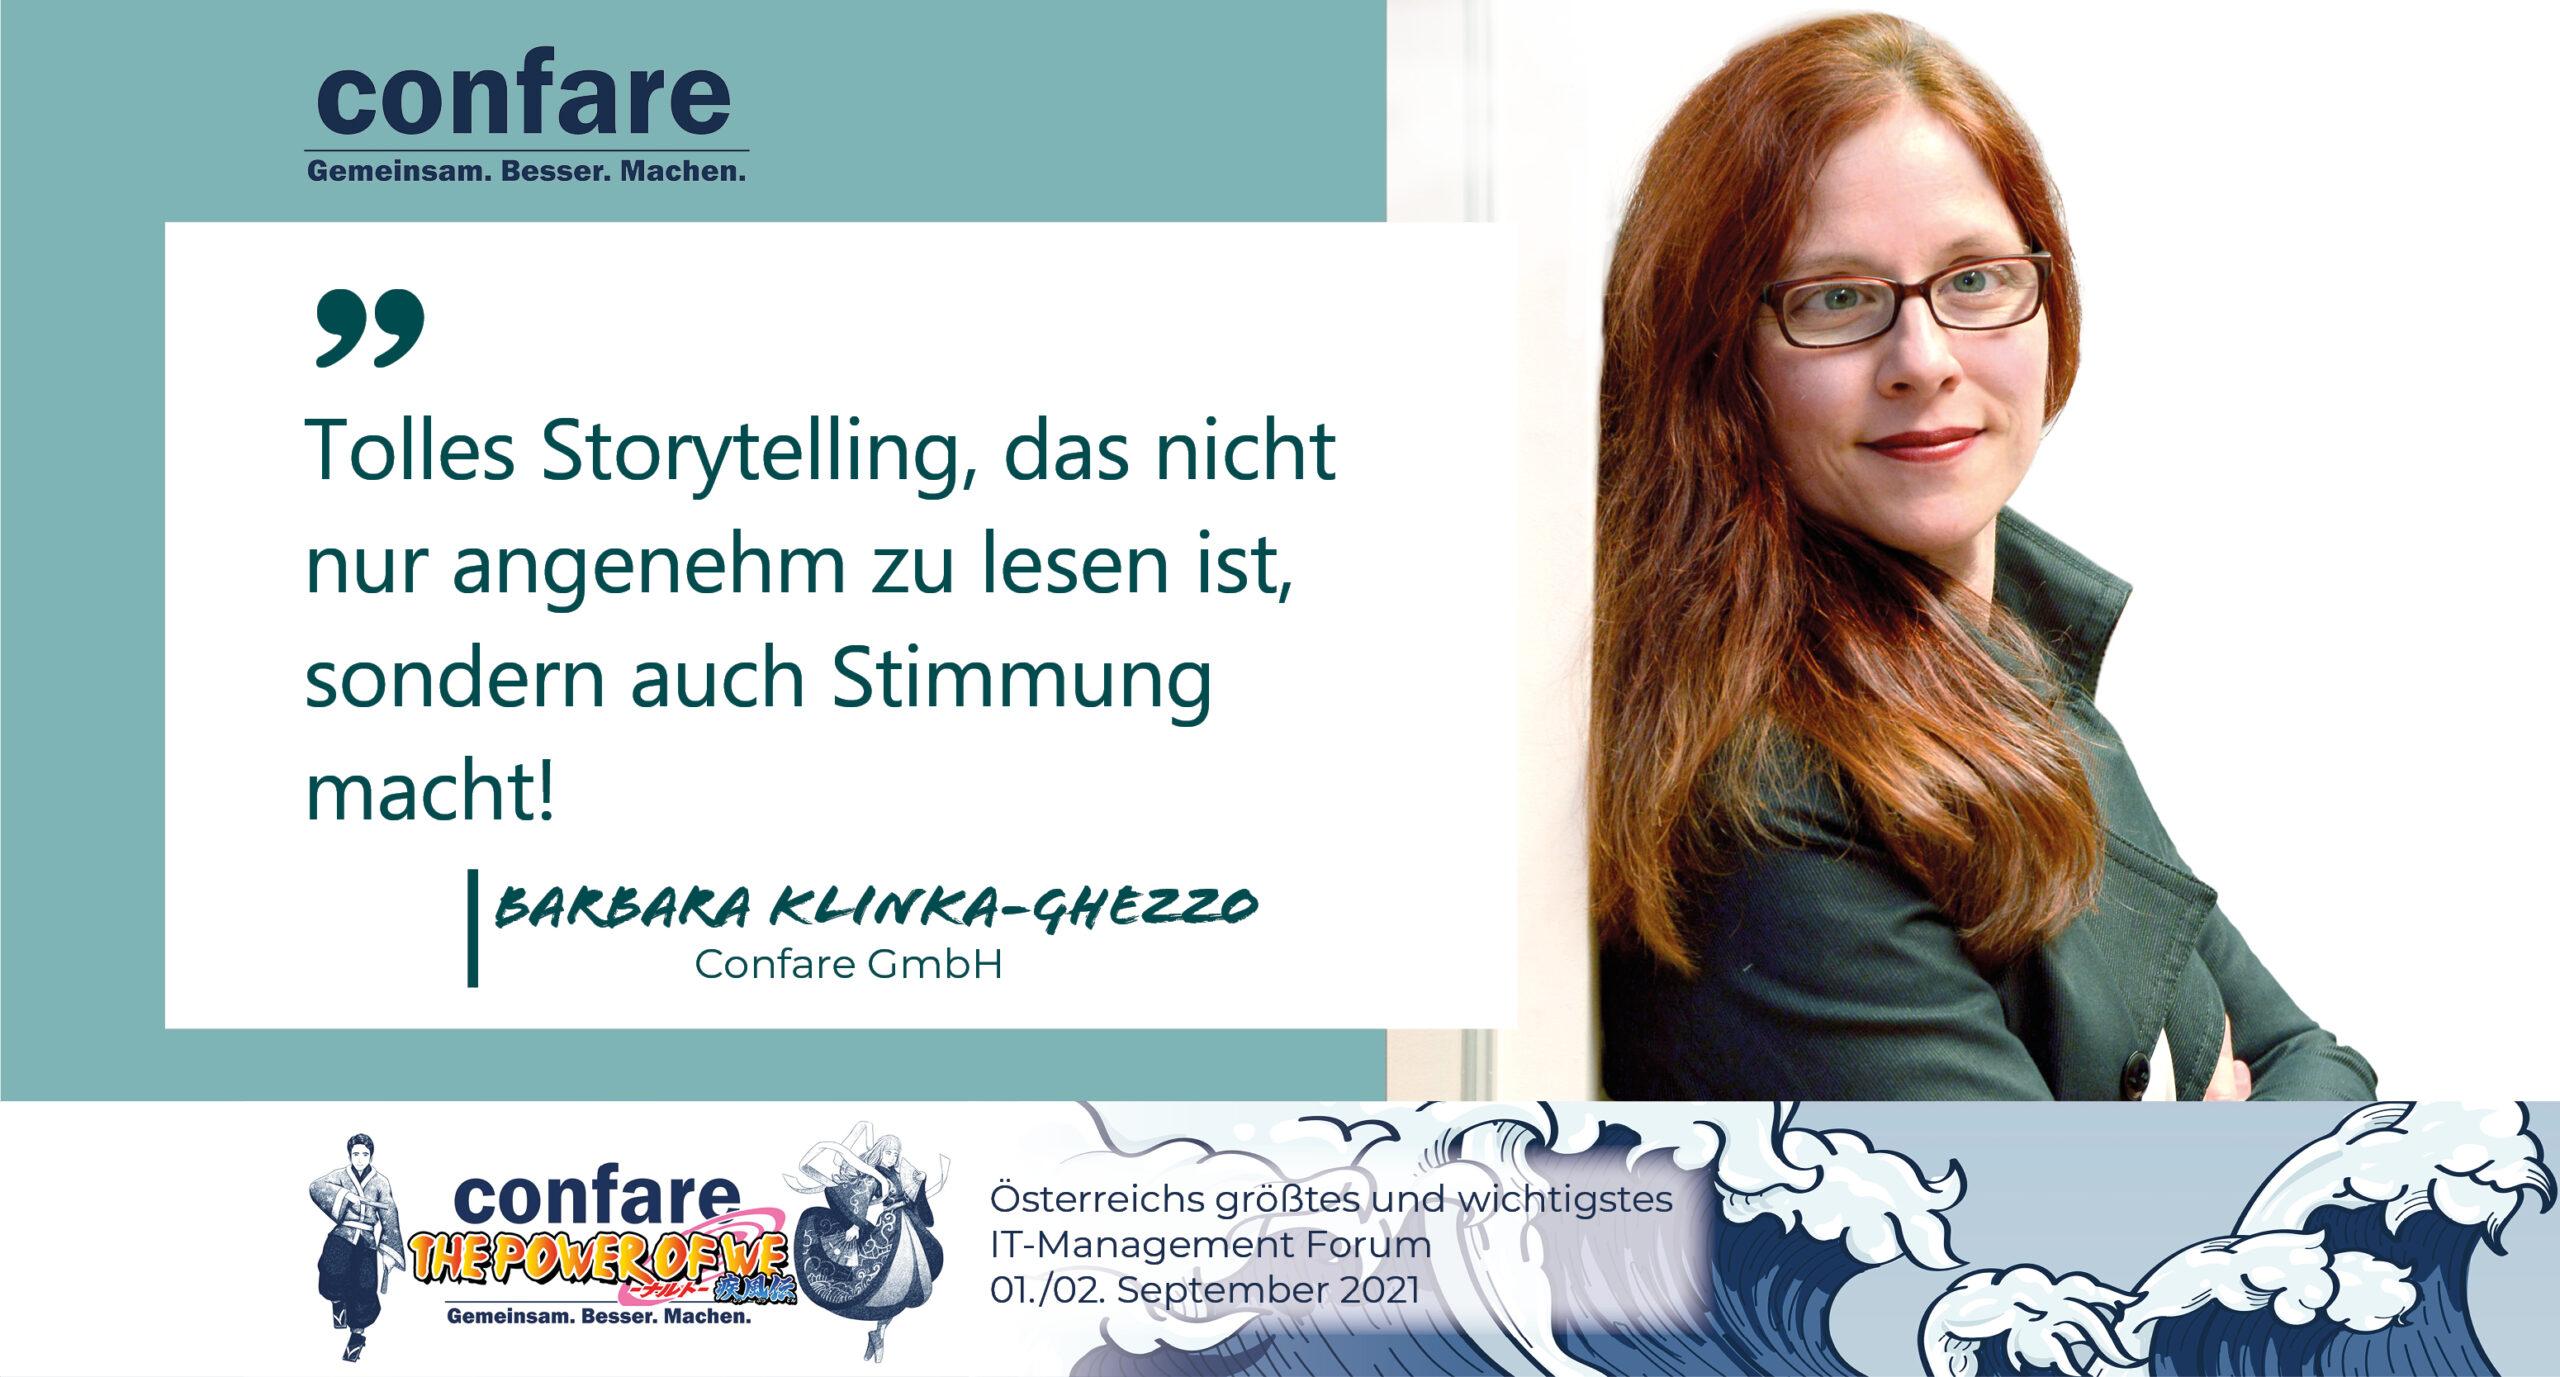 Barbara Klinka-Ghezzo